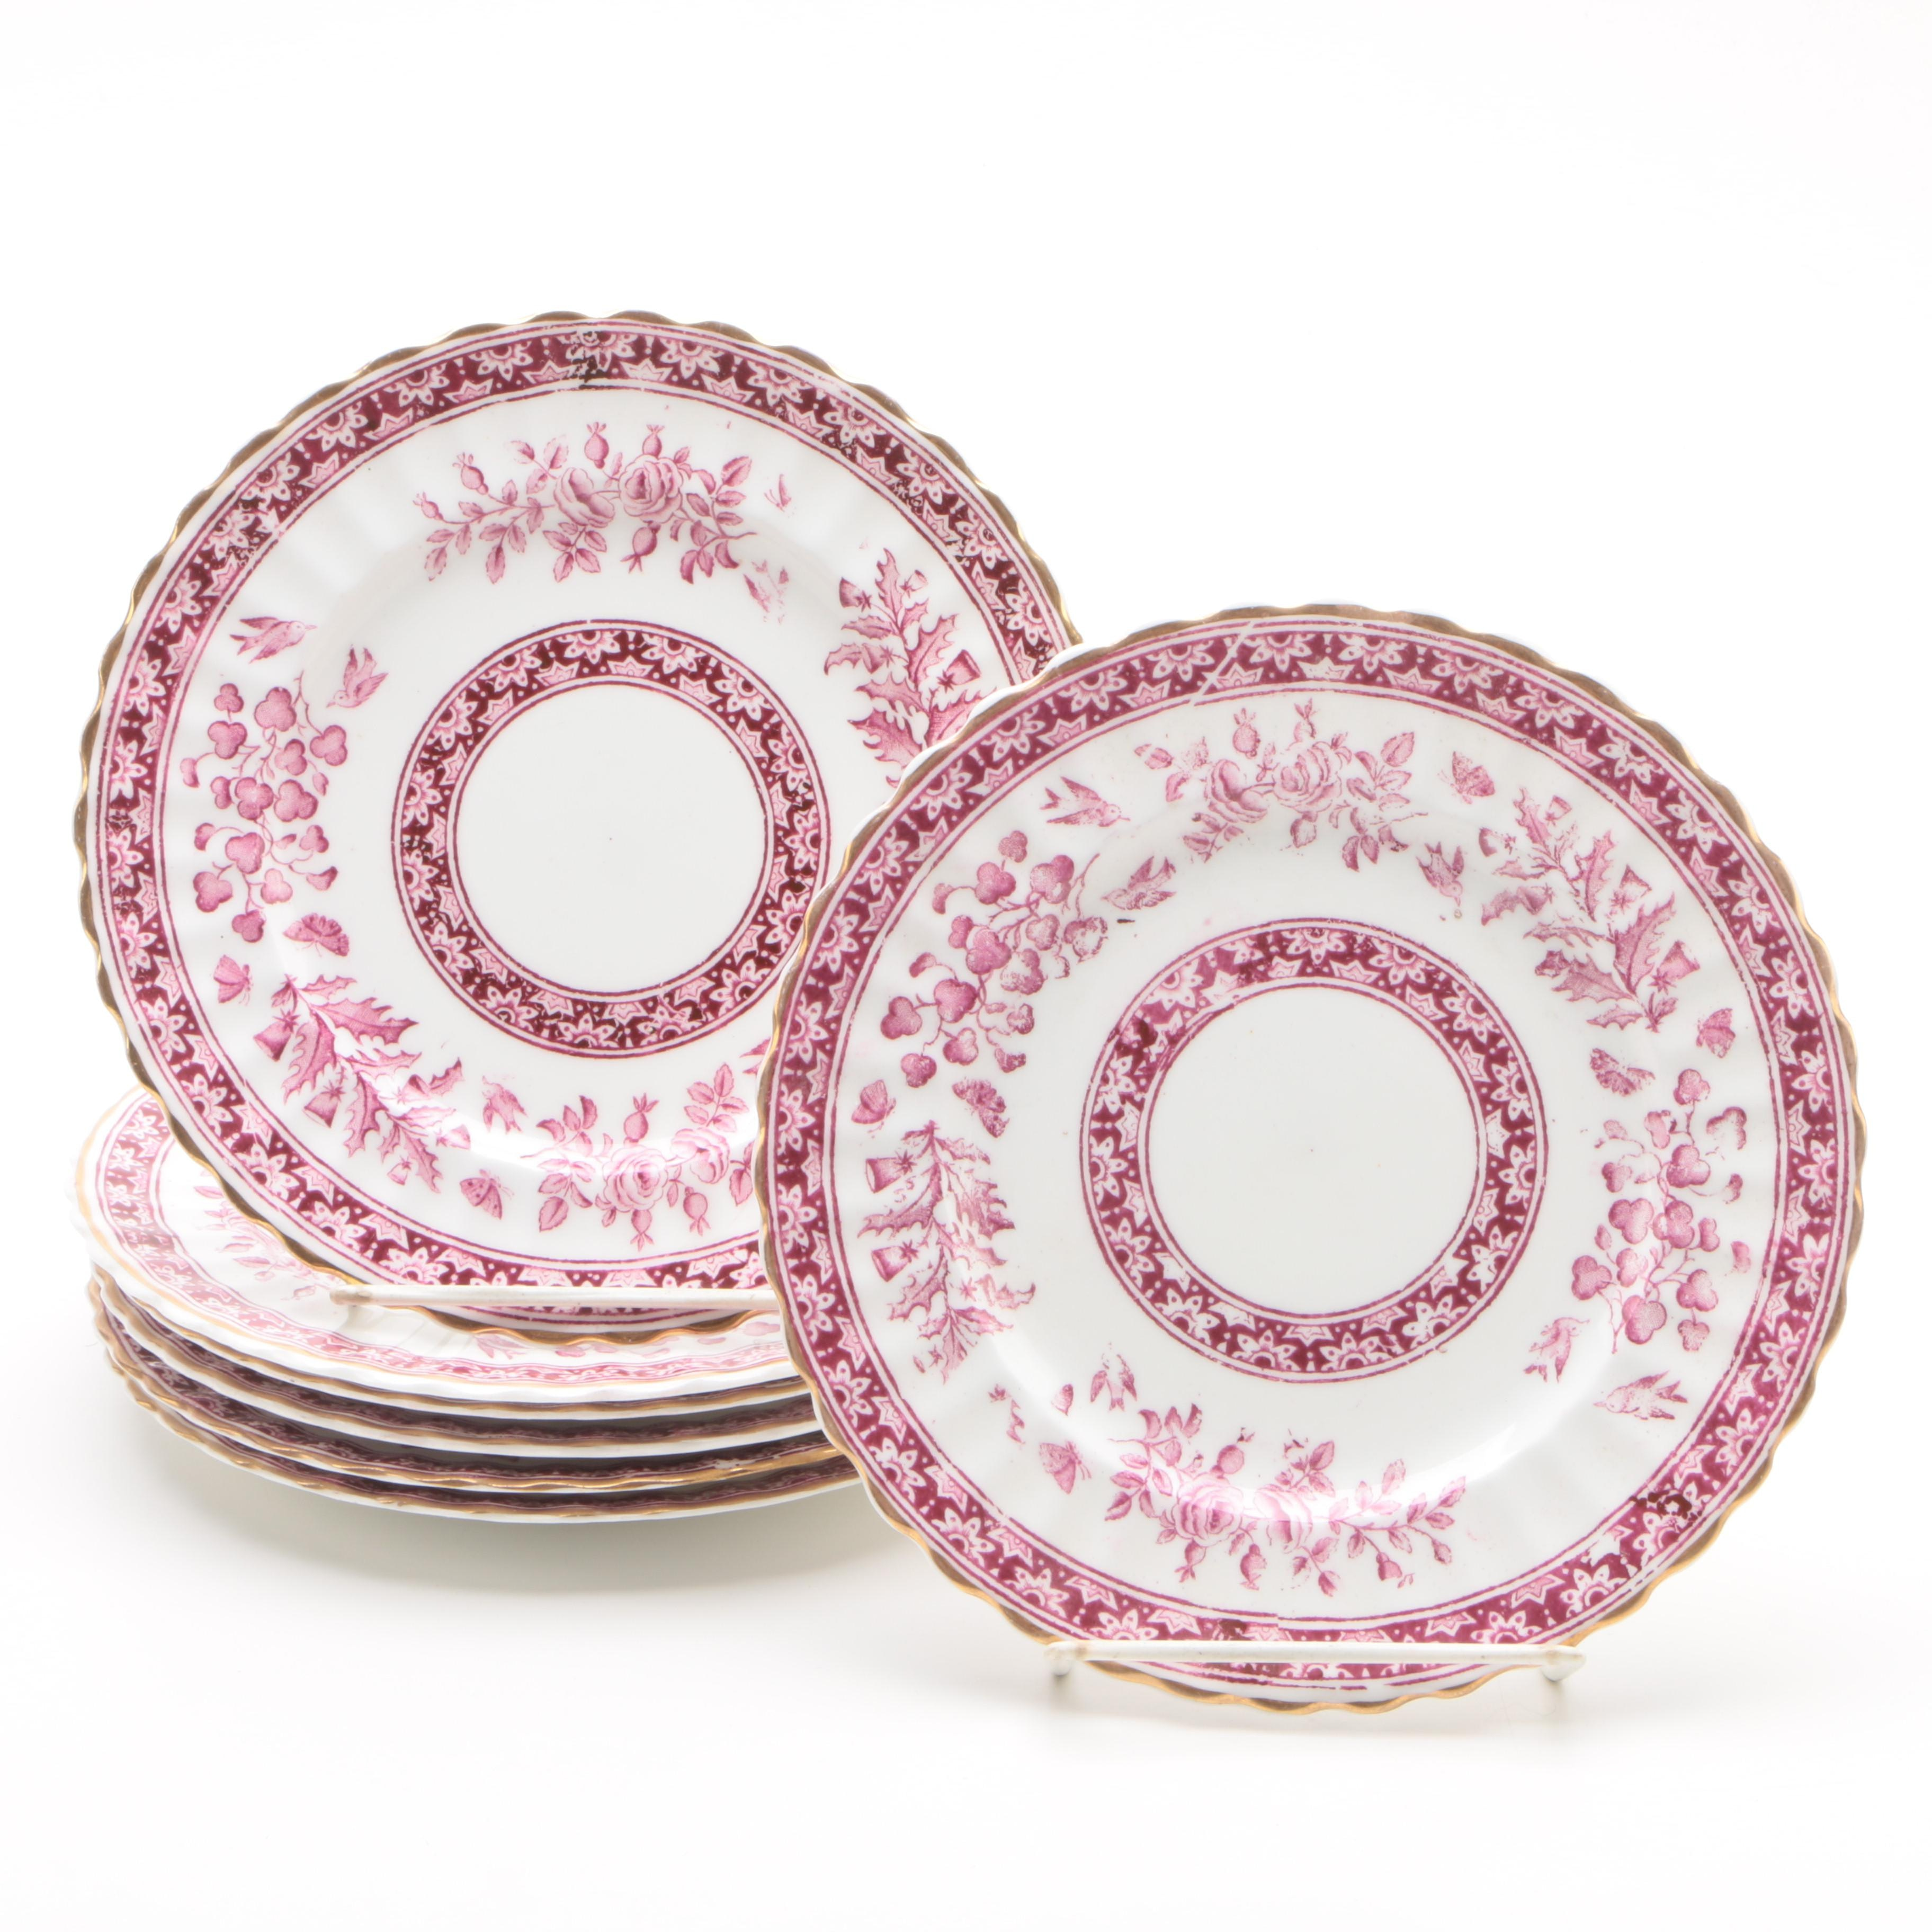 Sampson Bridgwood & Son Transfer-Printed Porcelain Salad Plates